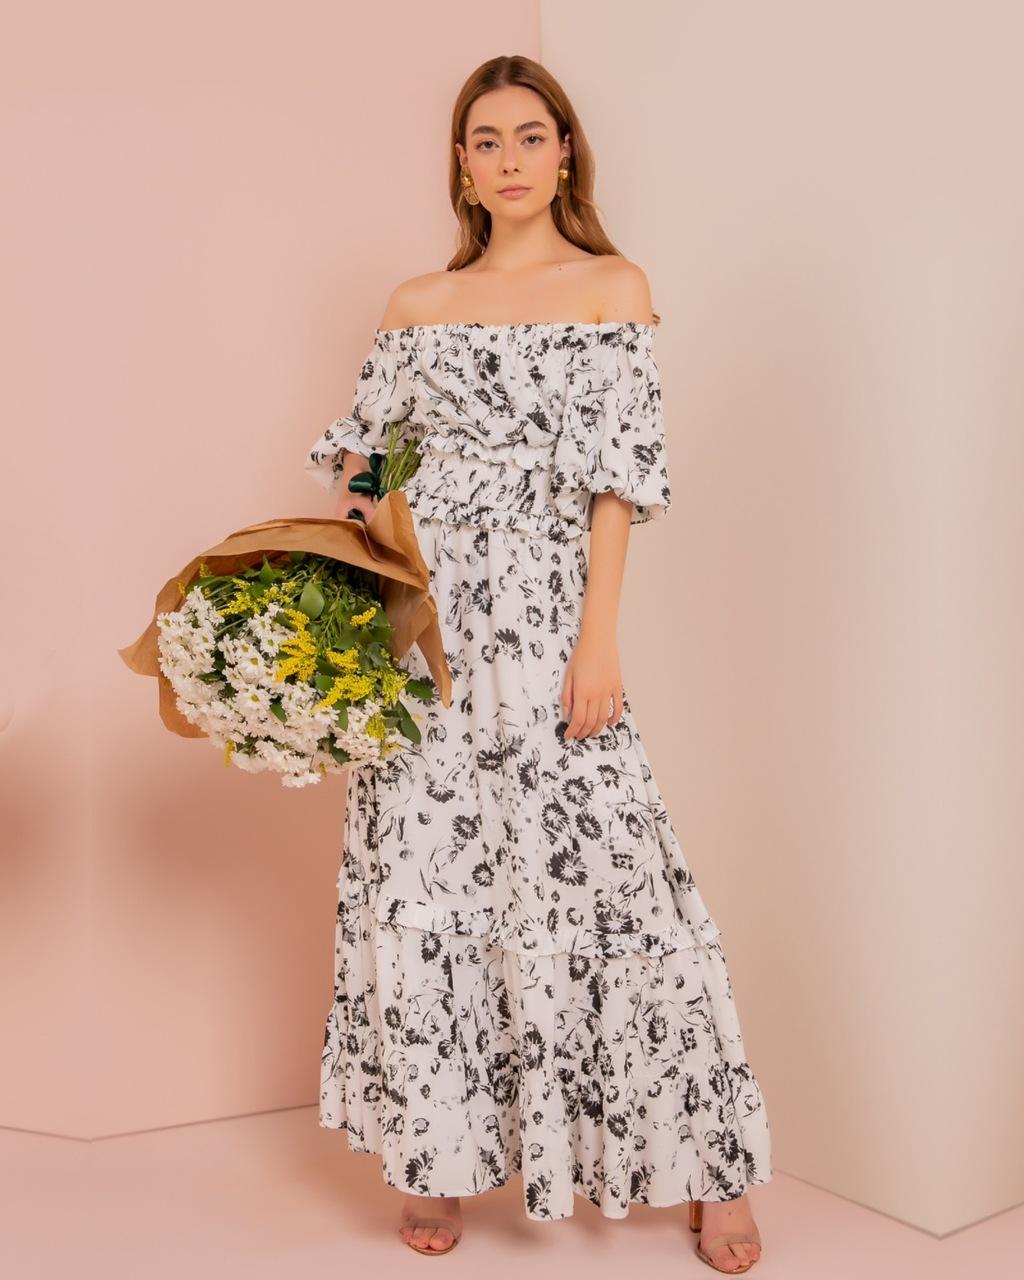 Vestido Longo Floral Ombro à Ombro